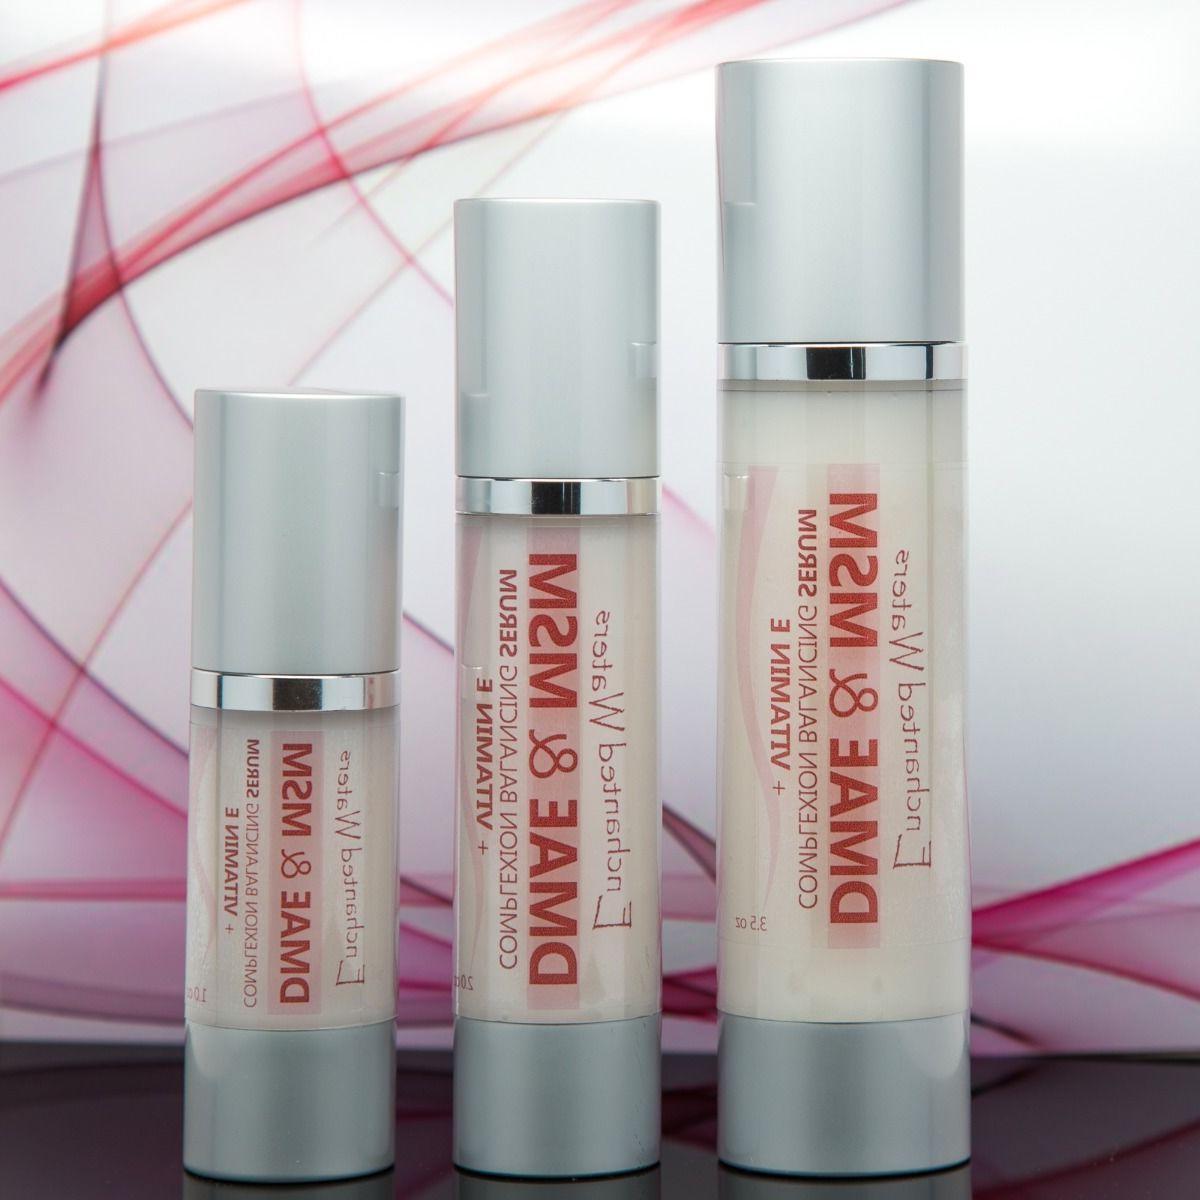 dmae and msm serum natural organic skin